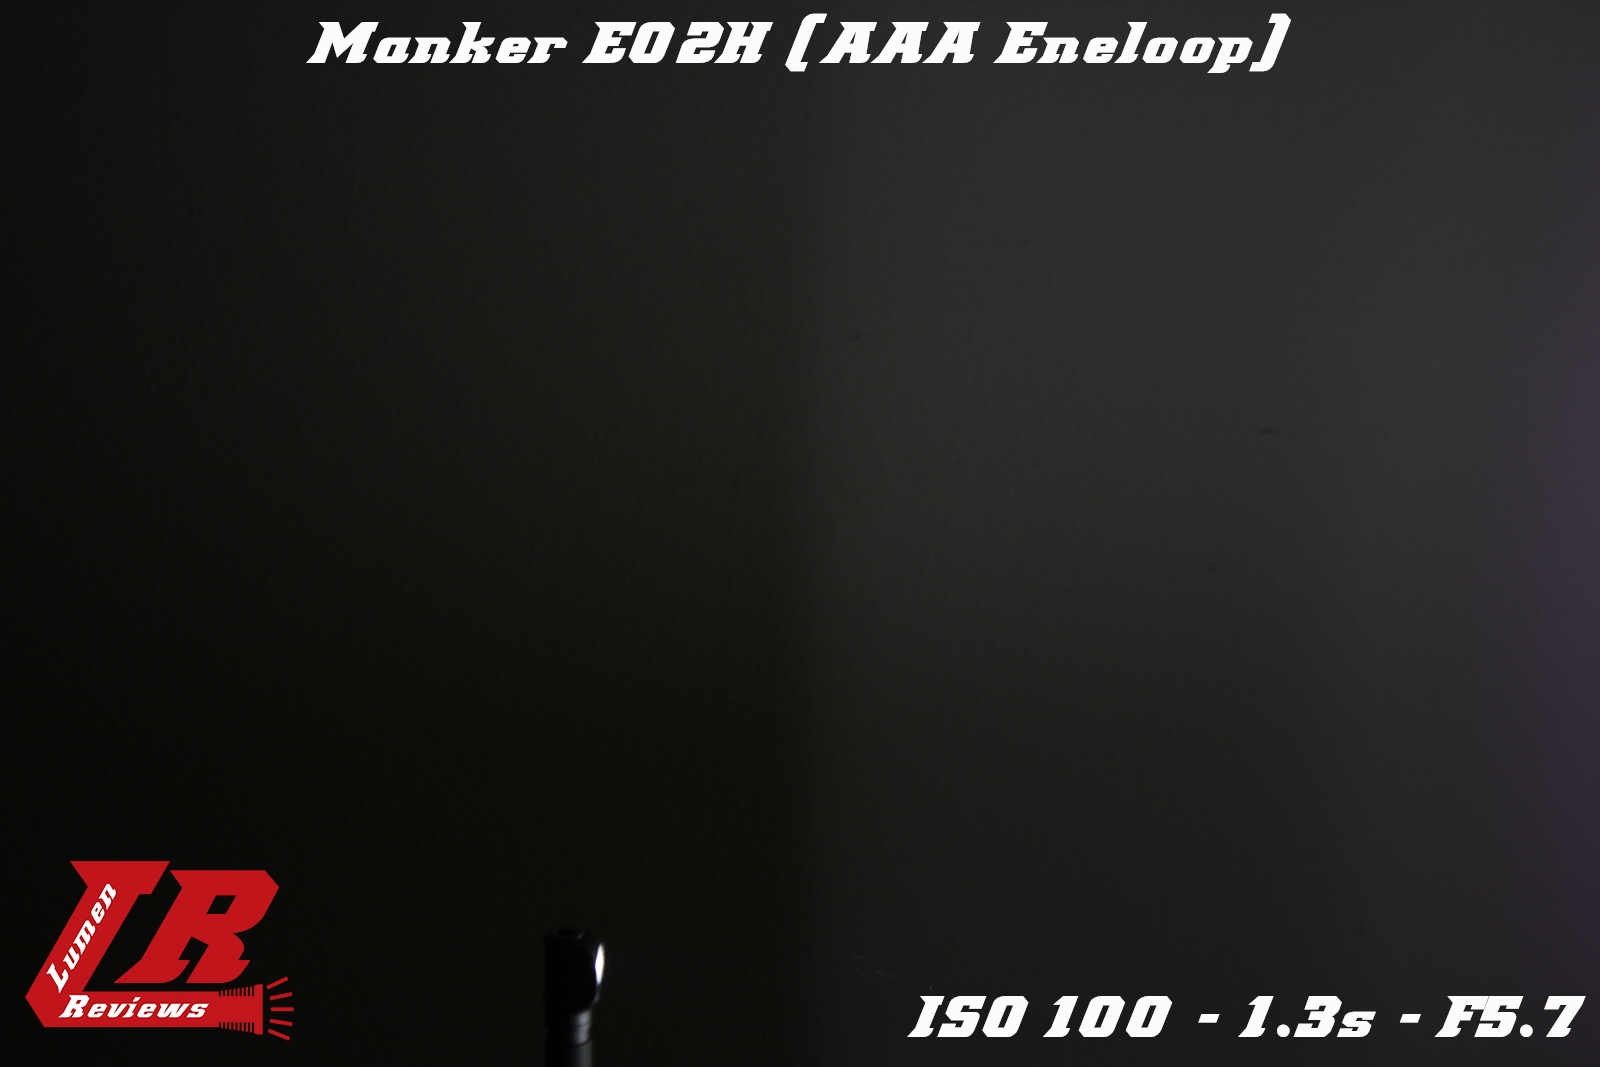 Manker E02H Beamshot 7